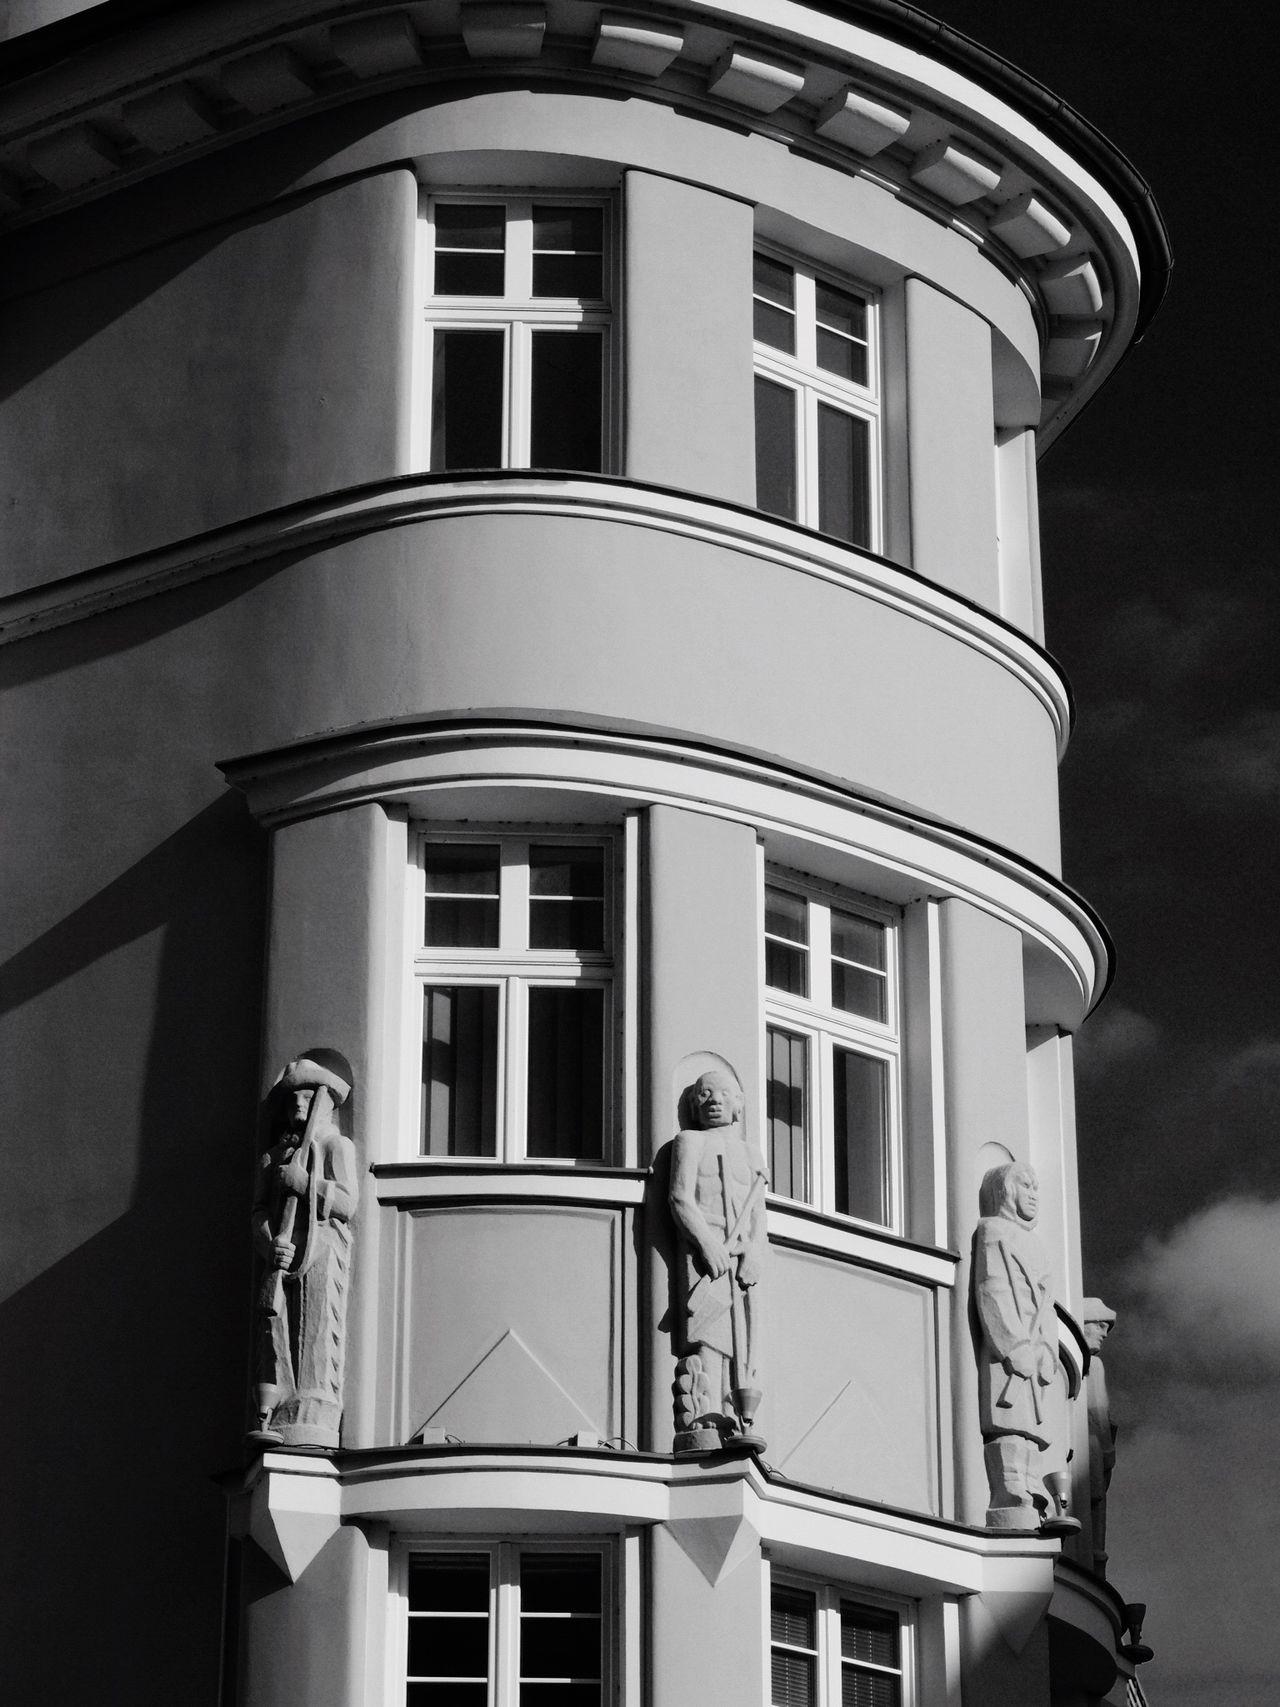 Architecture Window Outdoors Day Blackandwhite Czech Republic Liberec OlympusPEN City